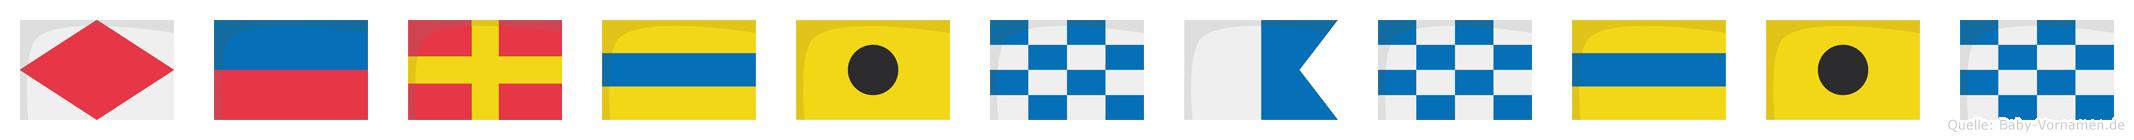 Ferdinandin im Flaggenalphabet